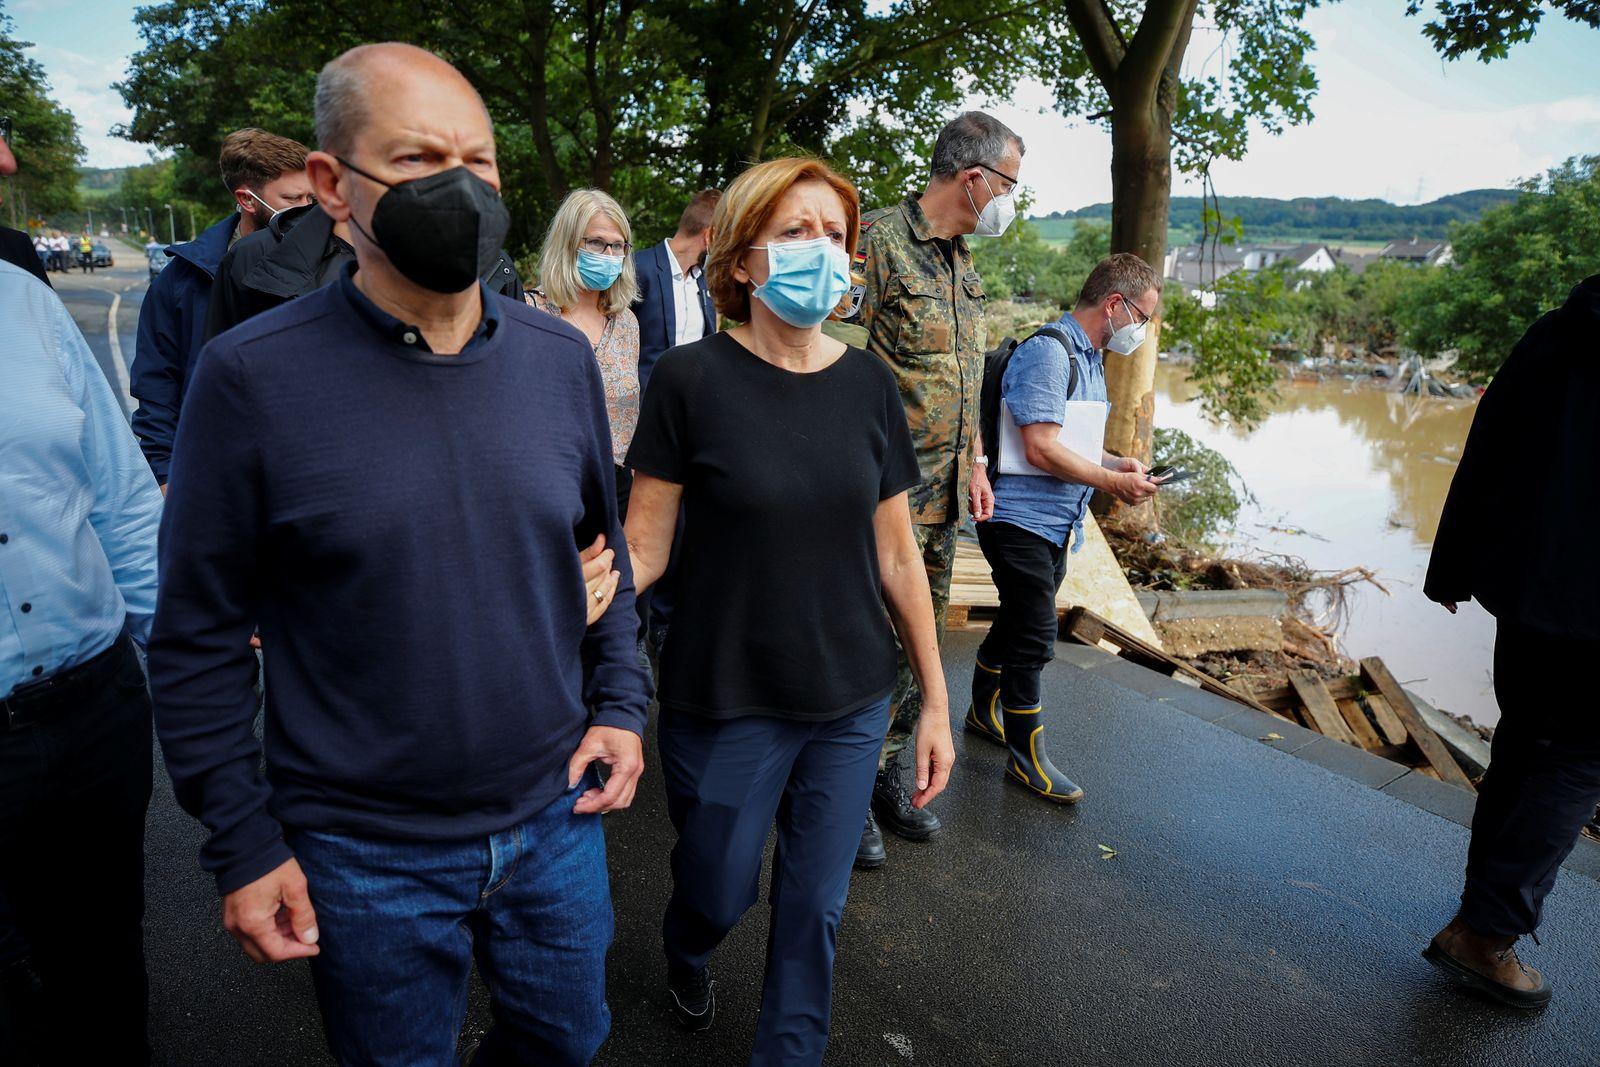 Prime Minister of Rhineland-Palatinate Malu Dreyer visits a damaged area following heavy rainfalls in Bad Neuenahr-Ahrweiler